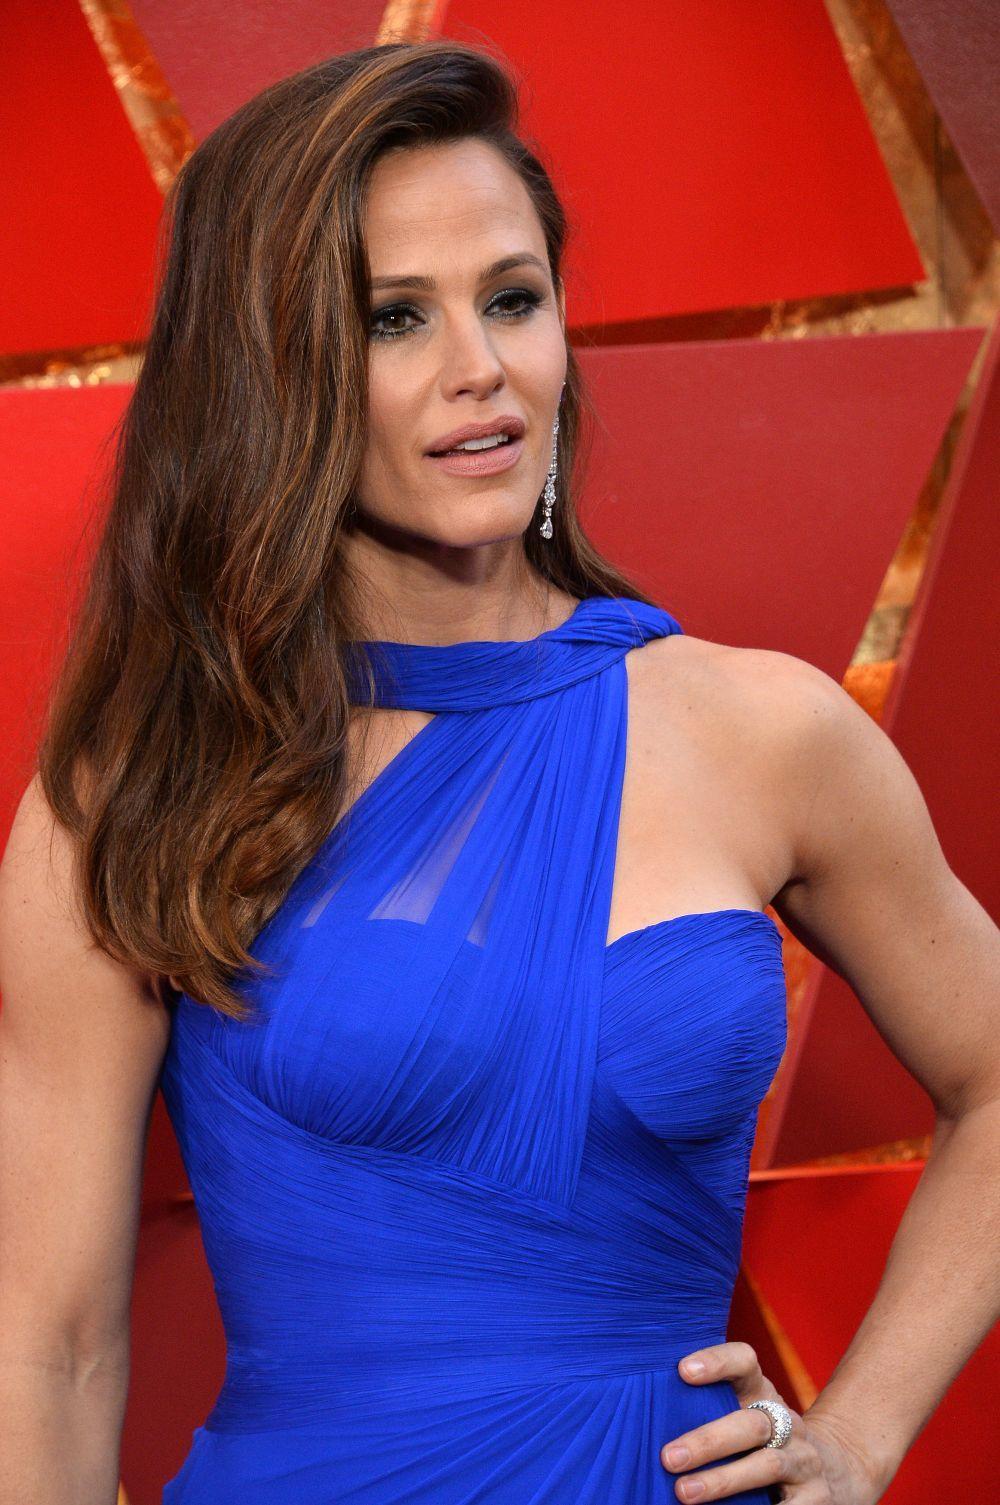 Vestido Azul Maquillaje Para Klein Vestidos Mujer Qxobthrsdc